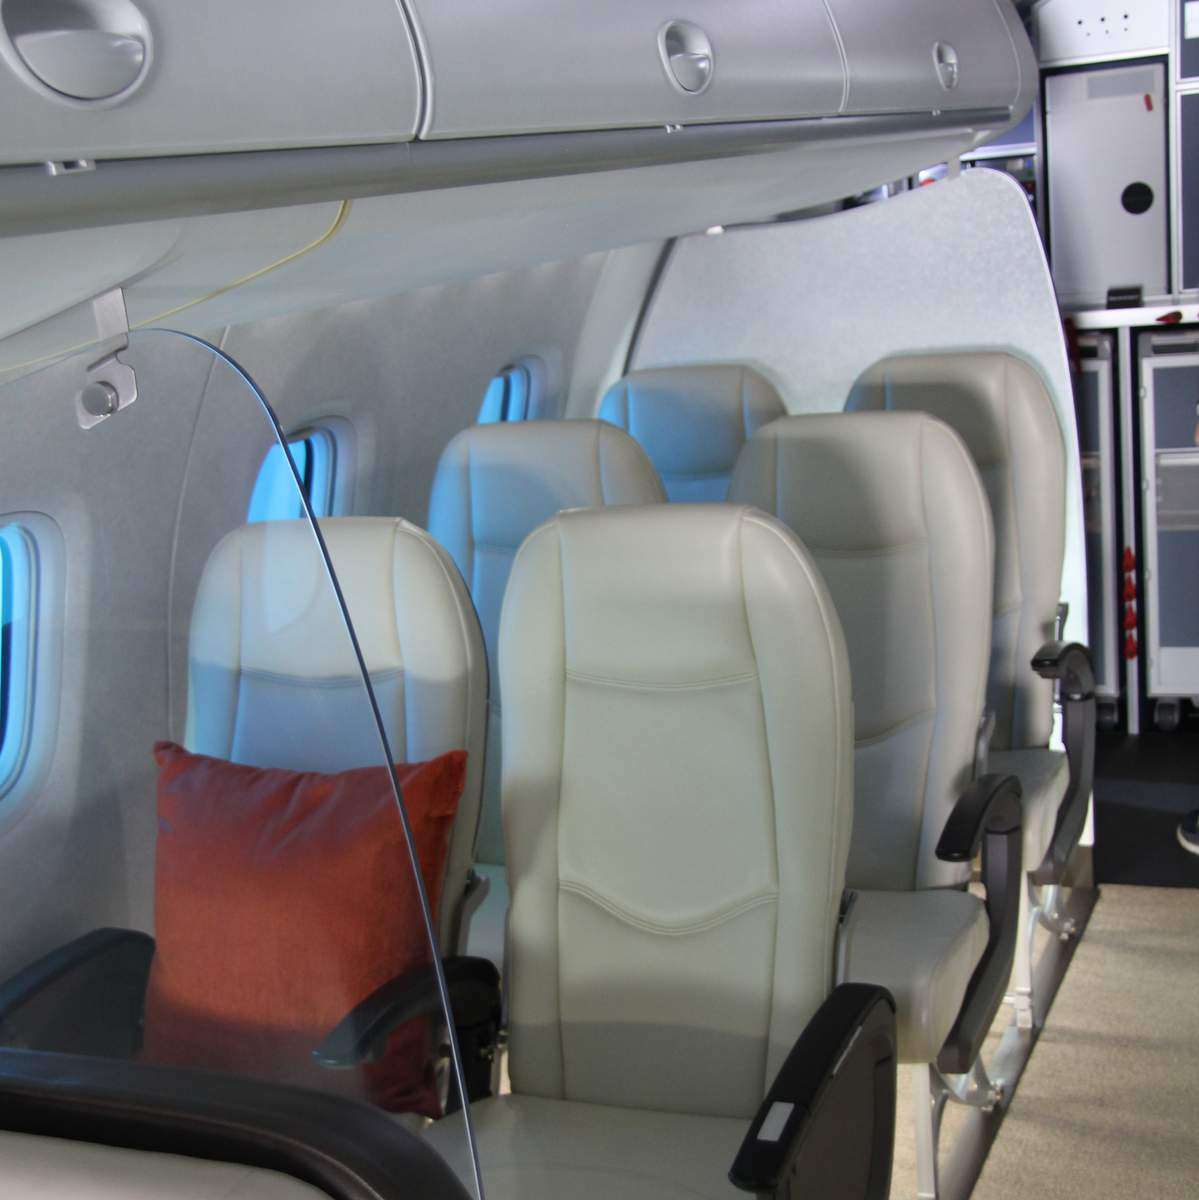 Economy class on the Mitsubishi MRJ mockup